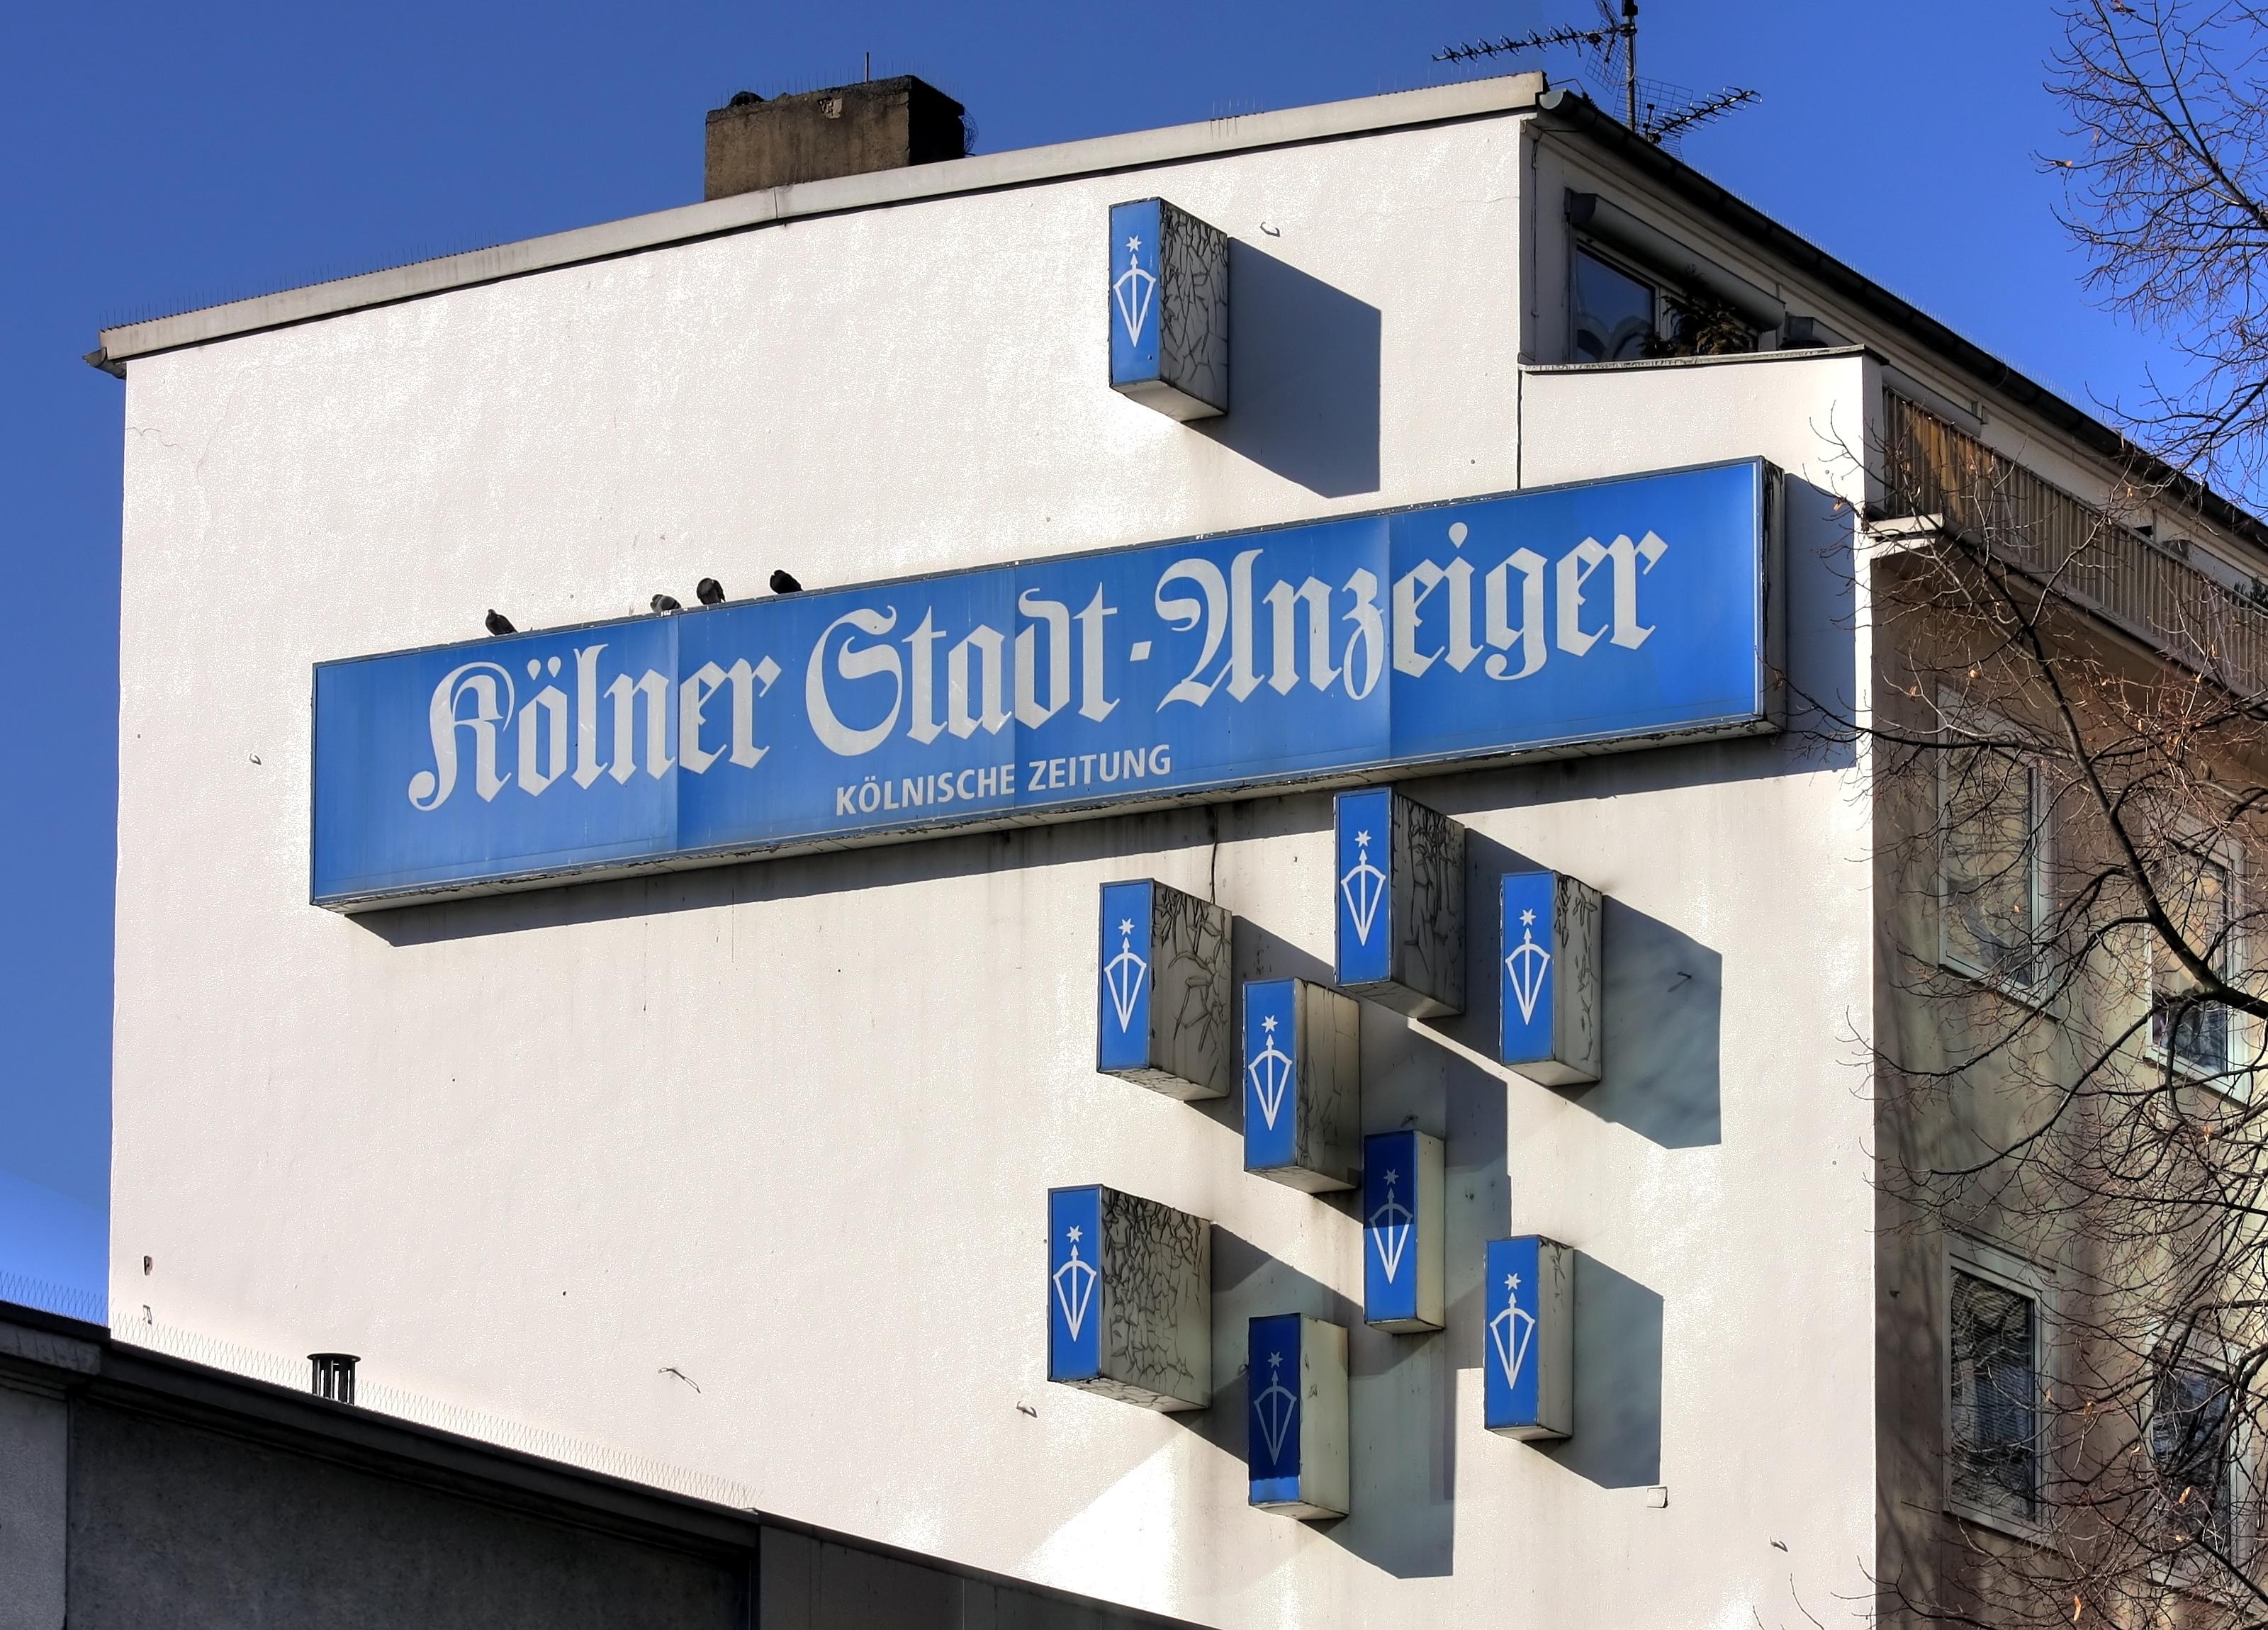 https://upload.wikimedia.org/wikipedia/commons/d/d3/K%C3%B6lner_Stadtanzeiger_-_Leuchtreklame_%284266-68%29.jpg